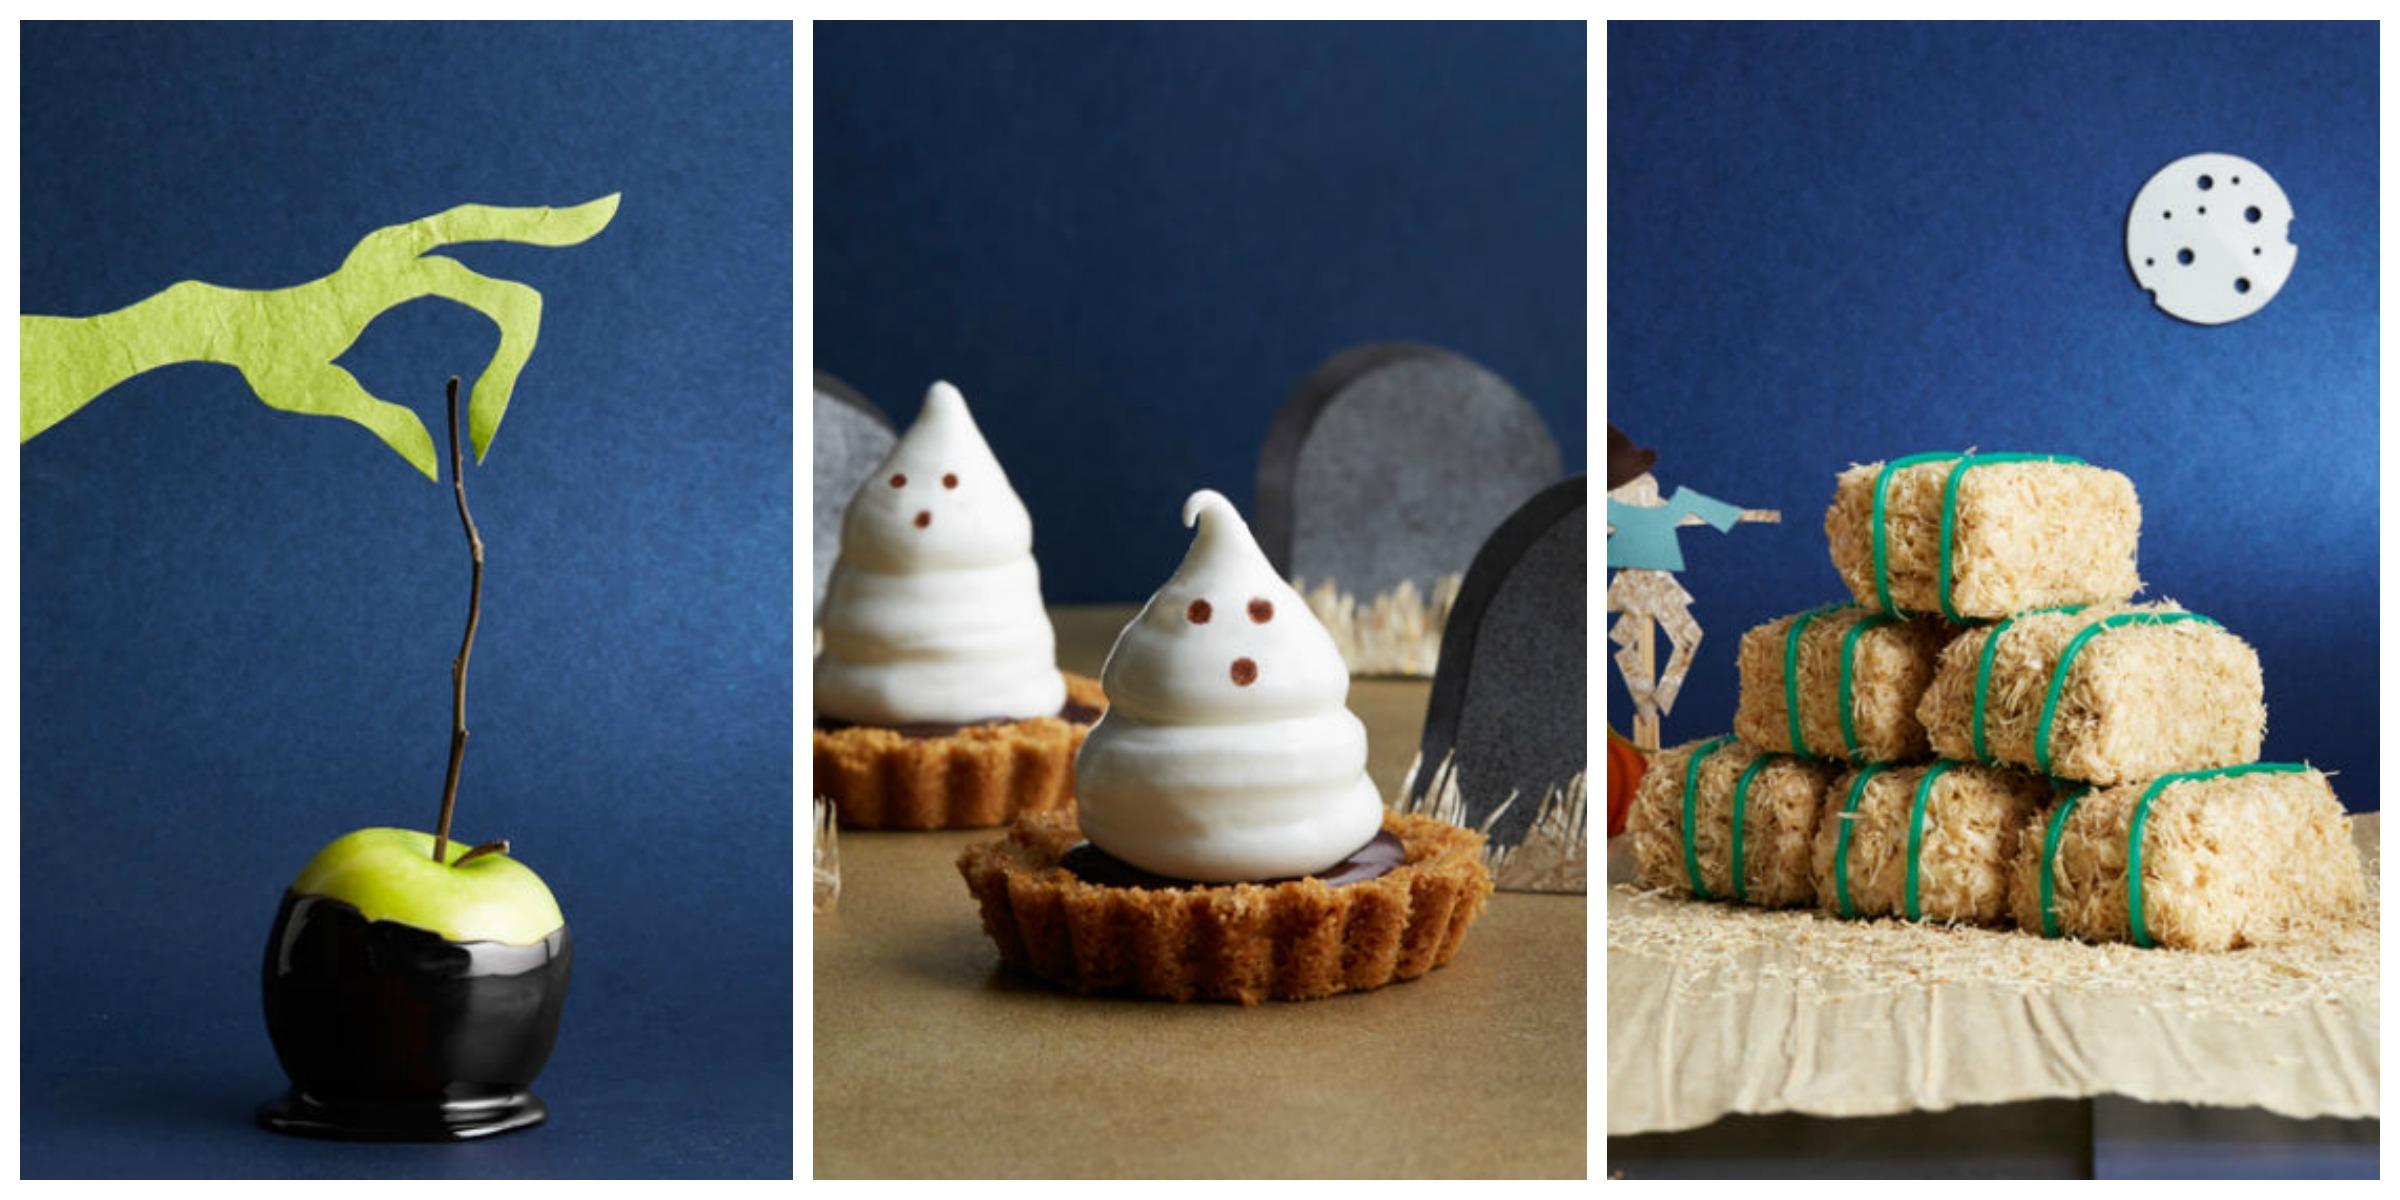 50 homemade halloween treats easy halloween dessert recipes. Black Bedroom Furniture Sets. Home Design Ideas